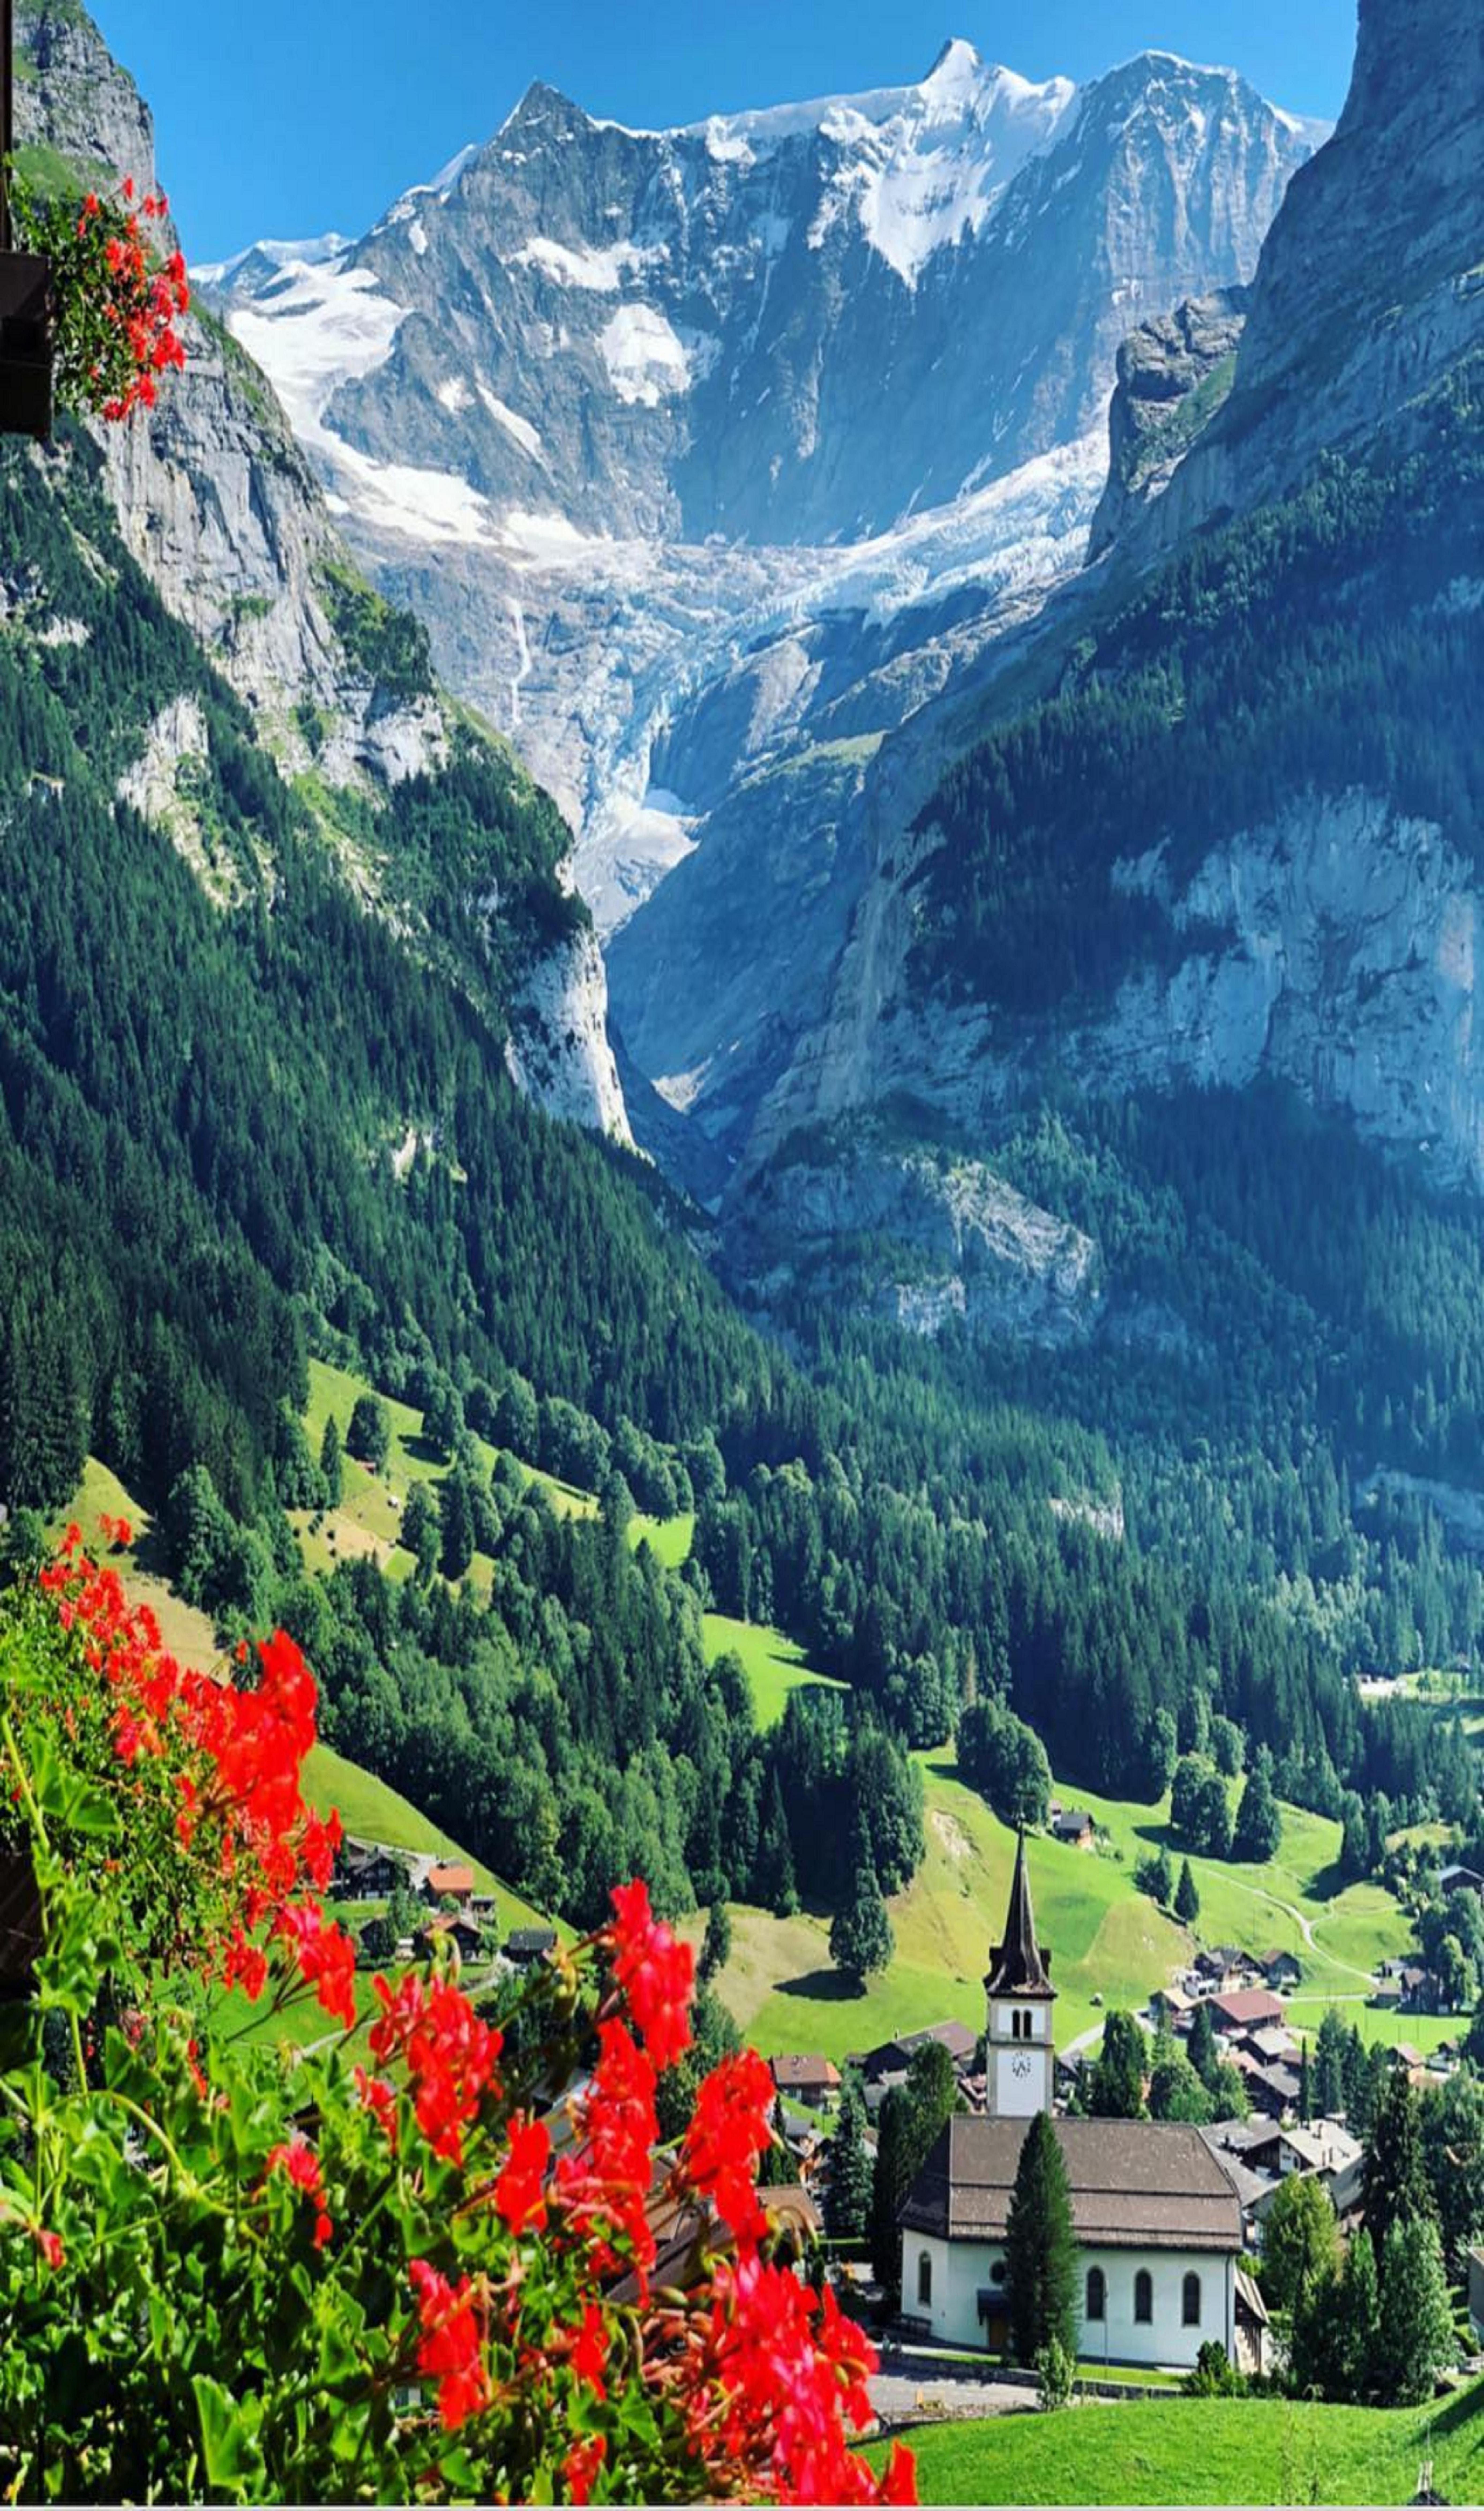 Pin By Lorna Mcdivitt On Nature Beautiful Landscapes Beautiful Places To Visit Beautiful Places